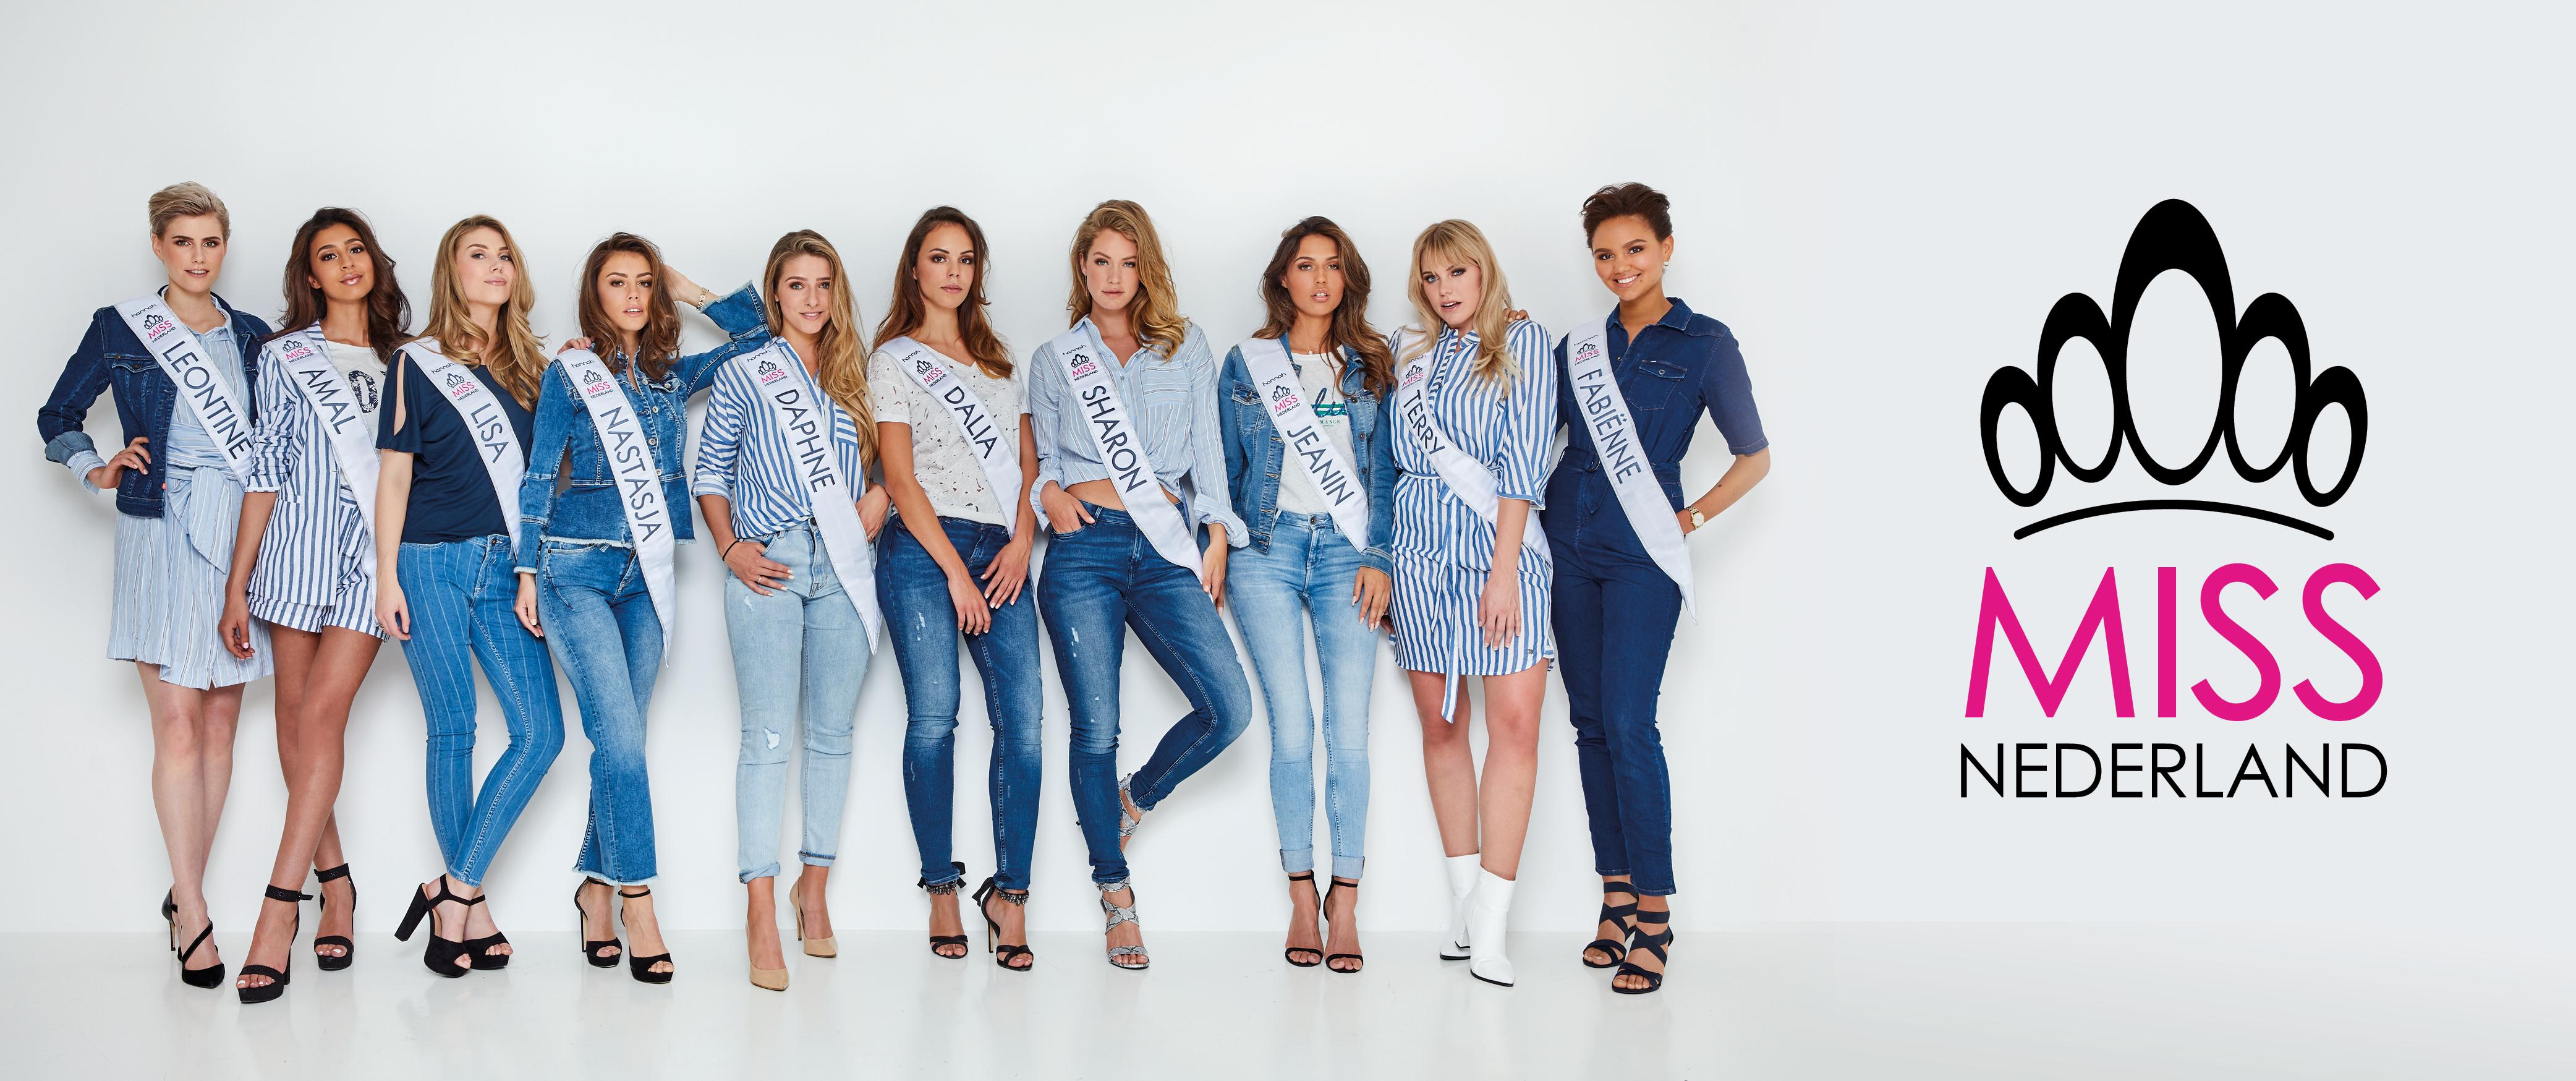 Miss Nederland finalisten_2019_Op jacht naar de kroon_William Rutten photography